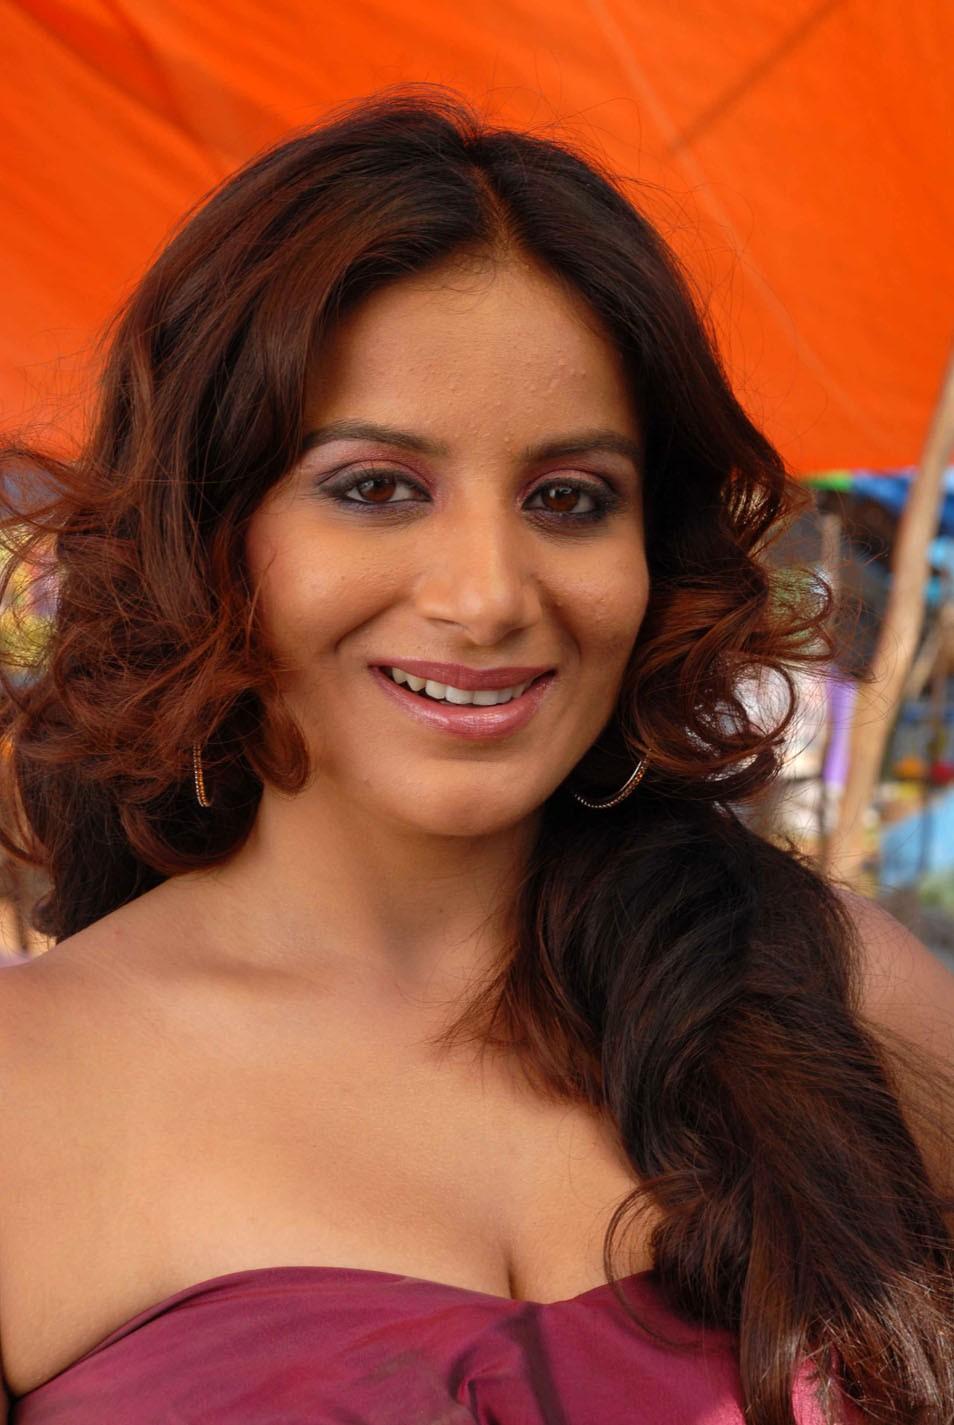 Tamil Mulai photos Kambu Kasaku Peperonity - Celebrity ...